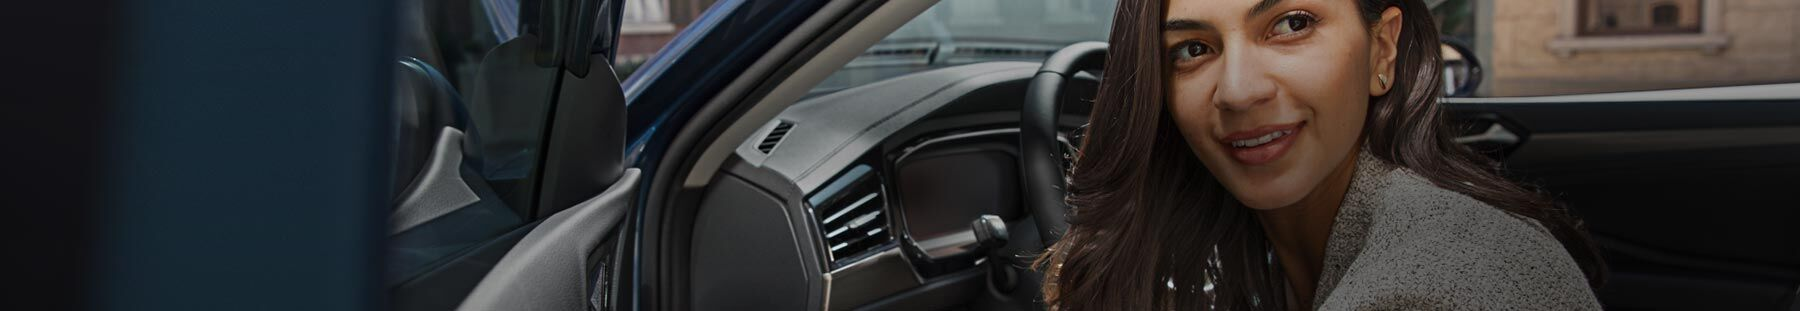 All New Volkswagen Jetta in Oneonta, NY